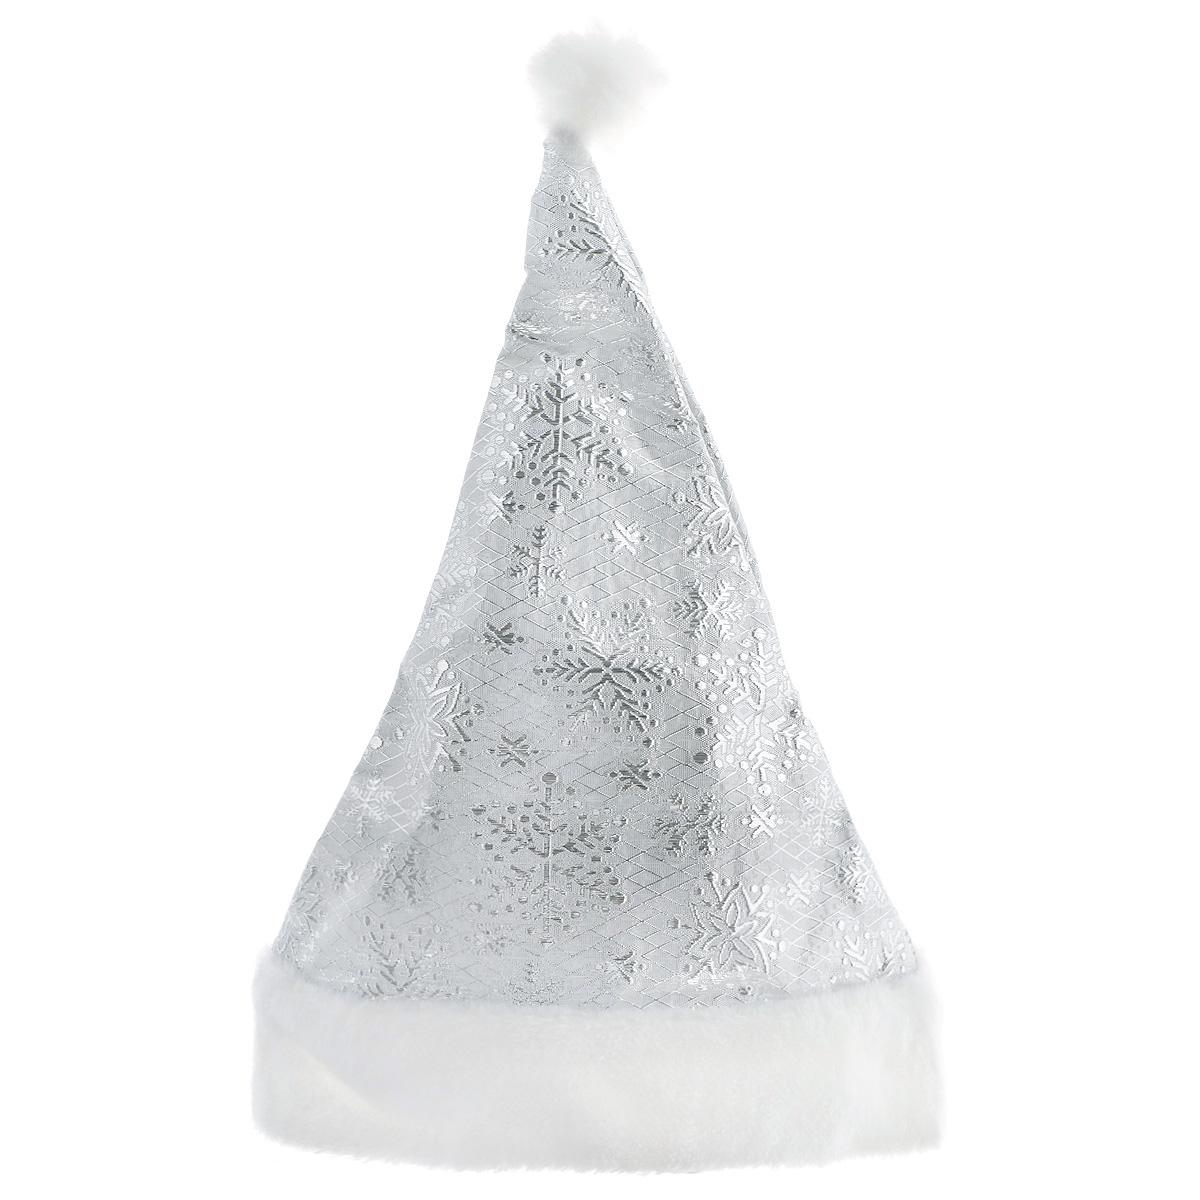 Колпак новогодний Sima-land Снежинки, цвет: серебристый719616